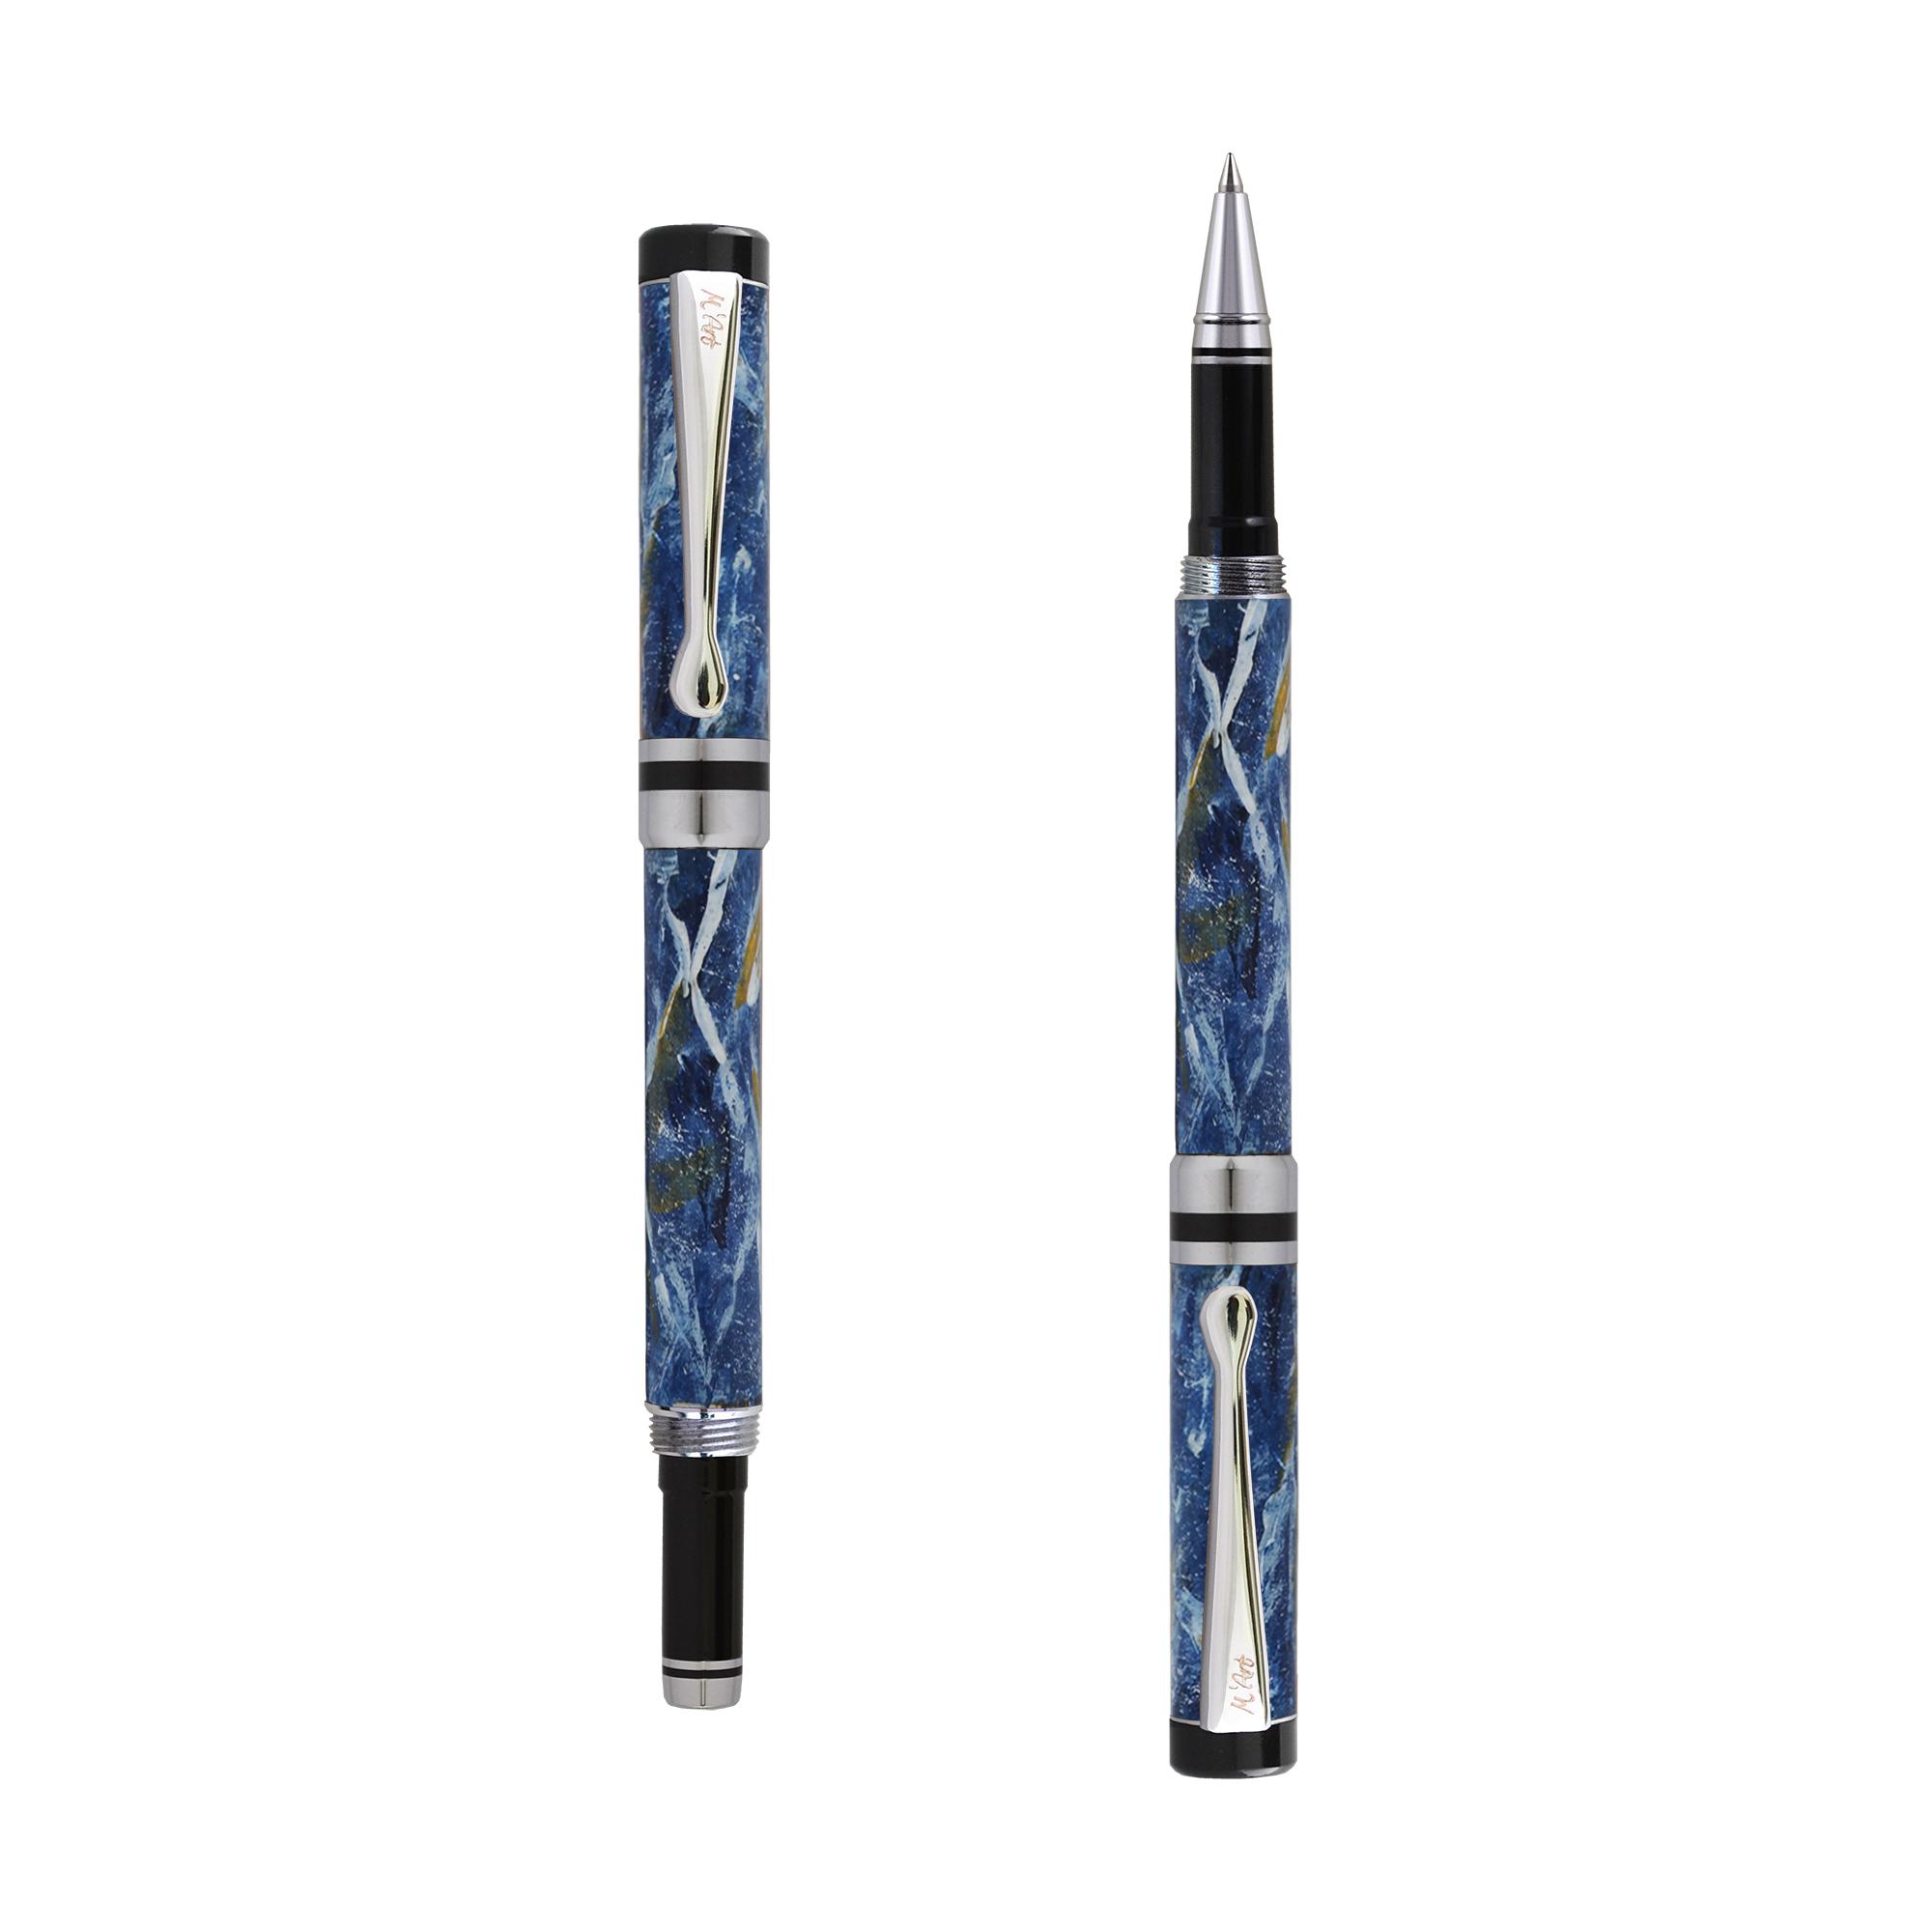 Ipazia roller Blu marble effect